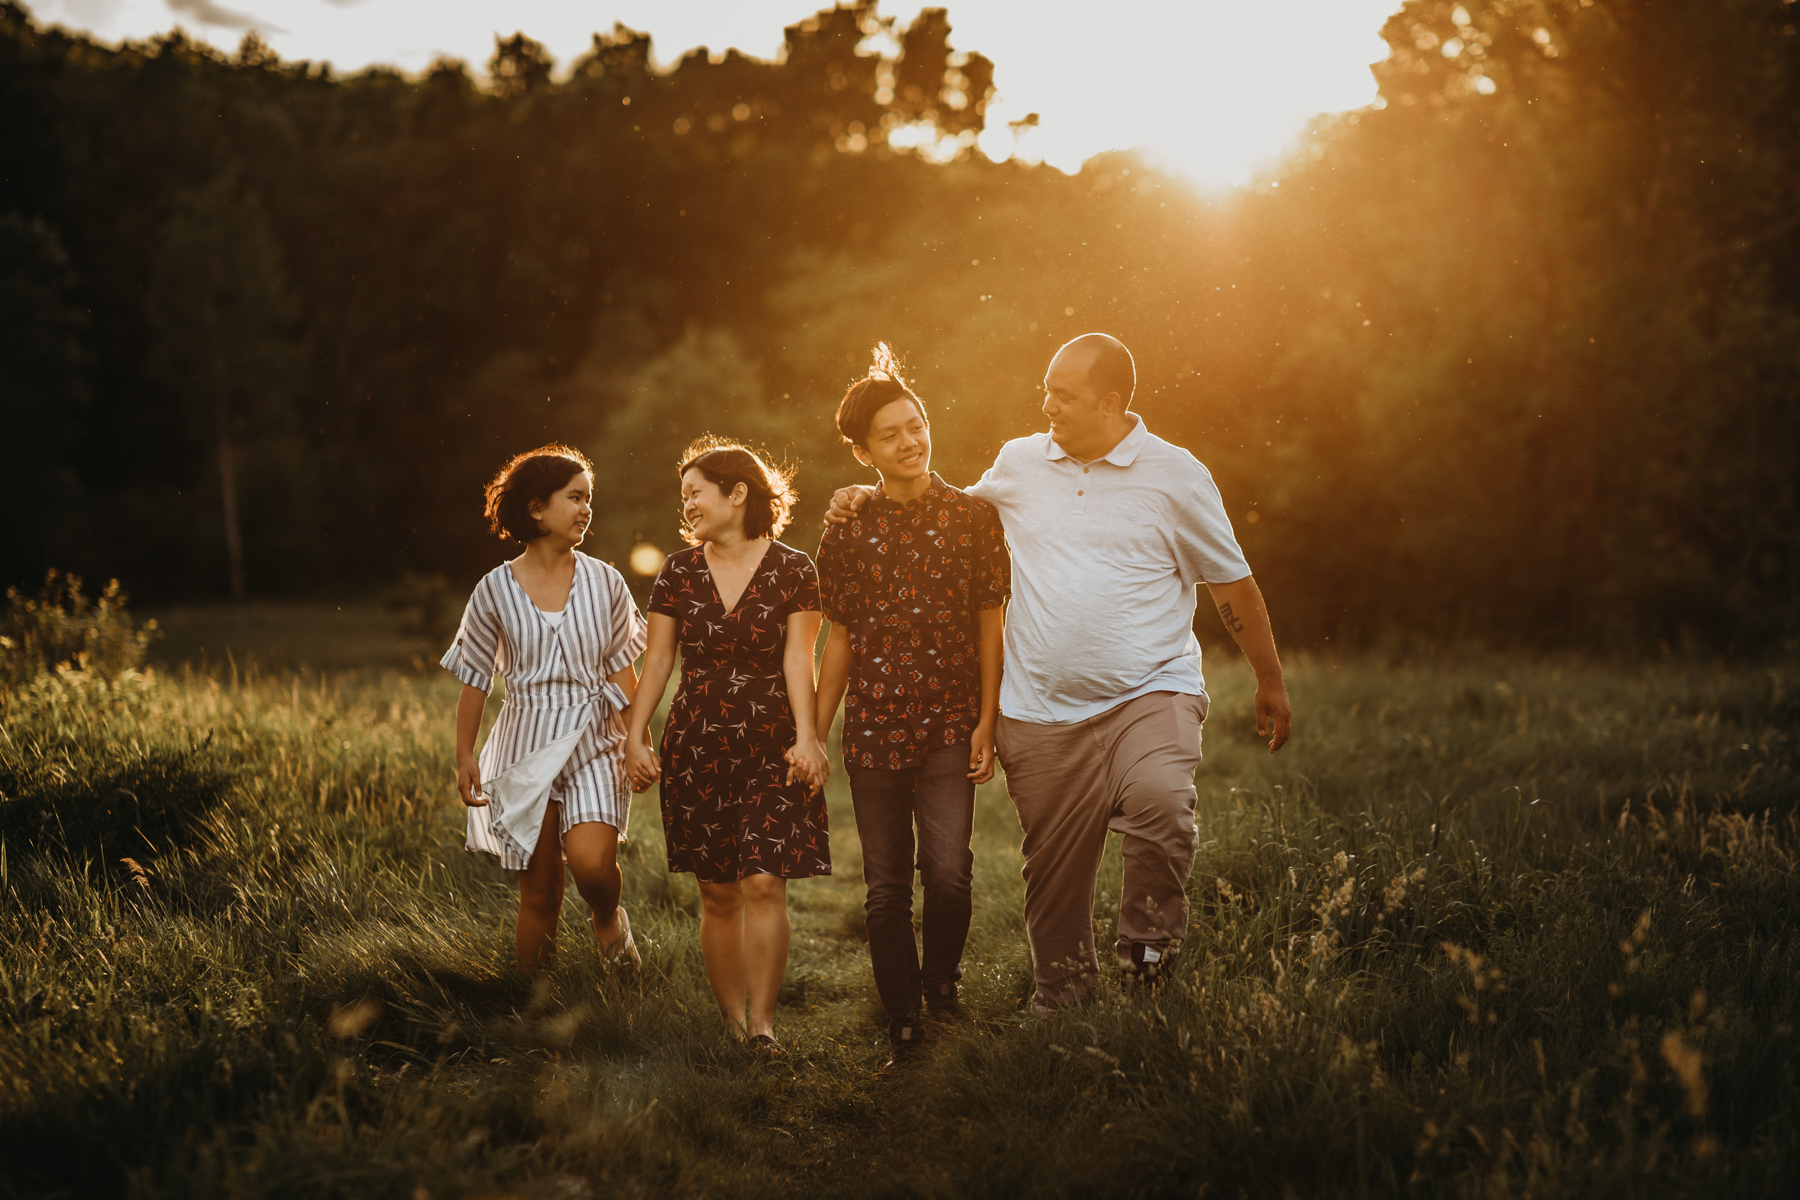 family-photos-teens-tweens-boston-family-photographer-10.jpg